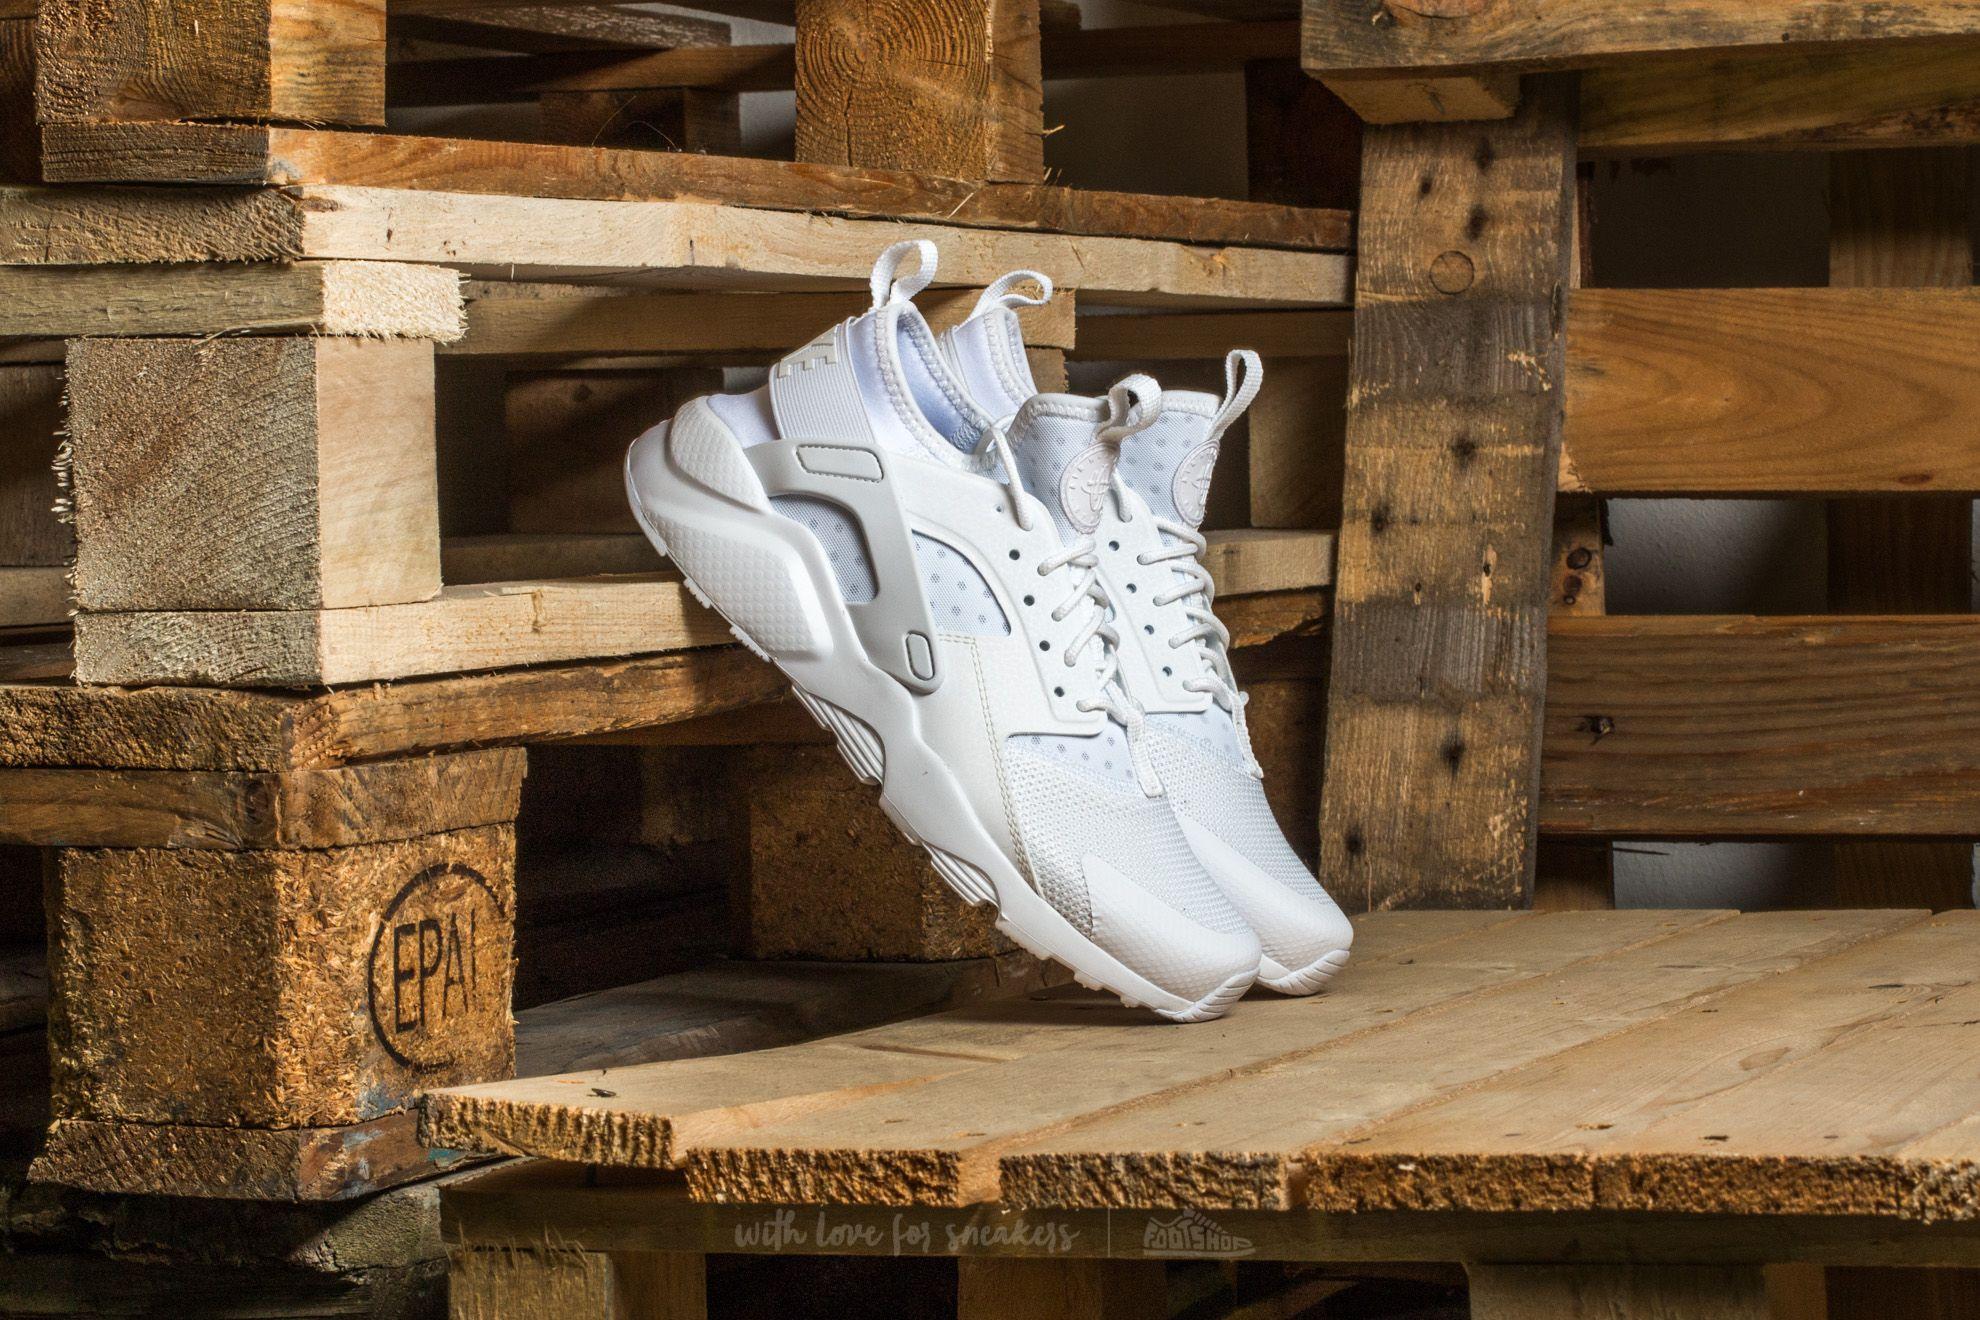 Nike Air Huarache Run Ultra Gs White/ White-White za skvělou cenu 2 890 Kč koupíte na Footshop.cz